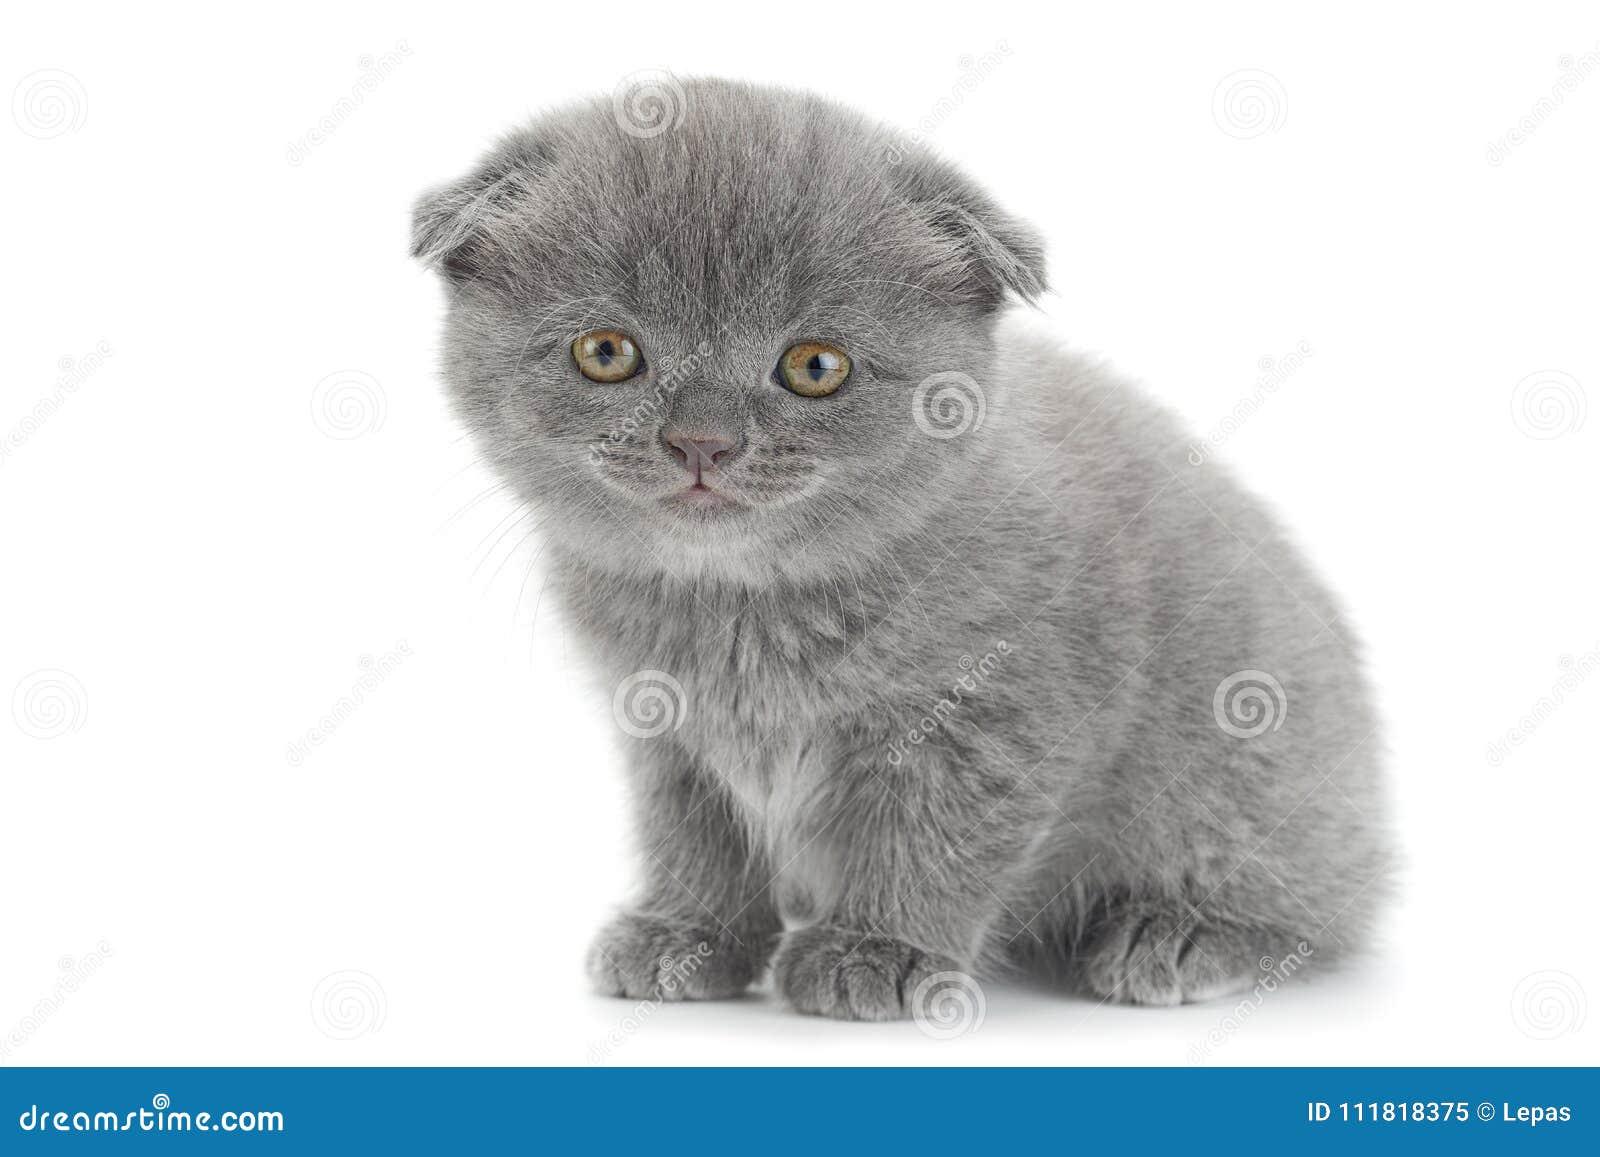 scottish fold gray cat stock image image of grey little 111818375. Black Bedroom Furniture Sets. Home Design Ideas